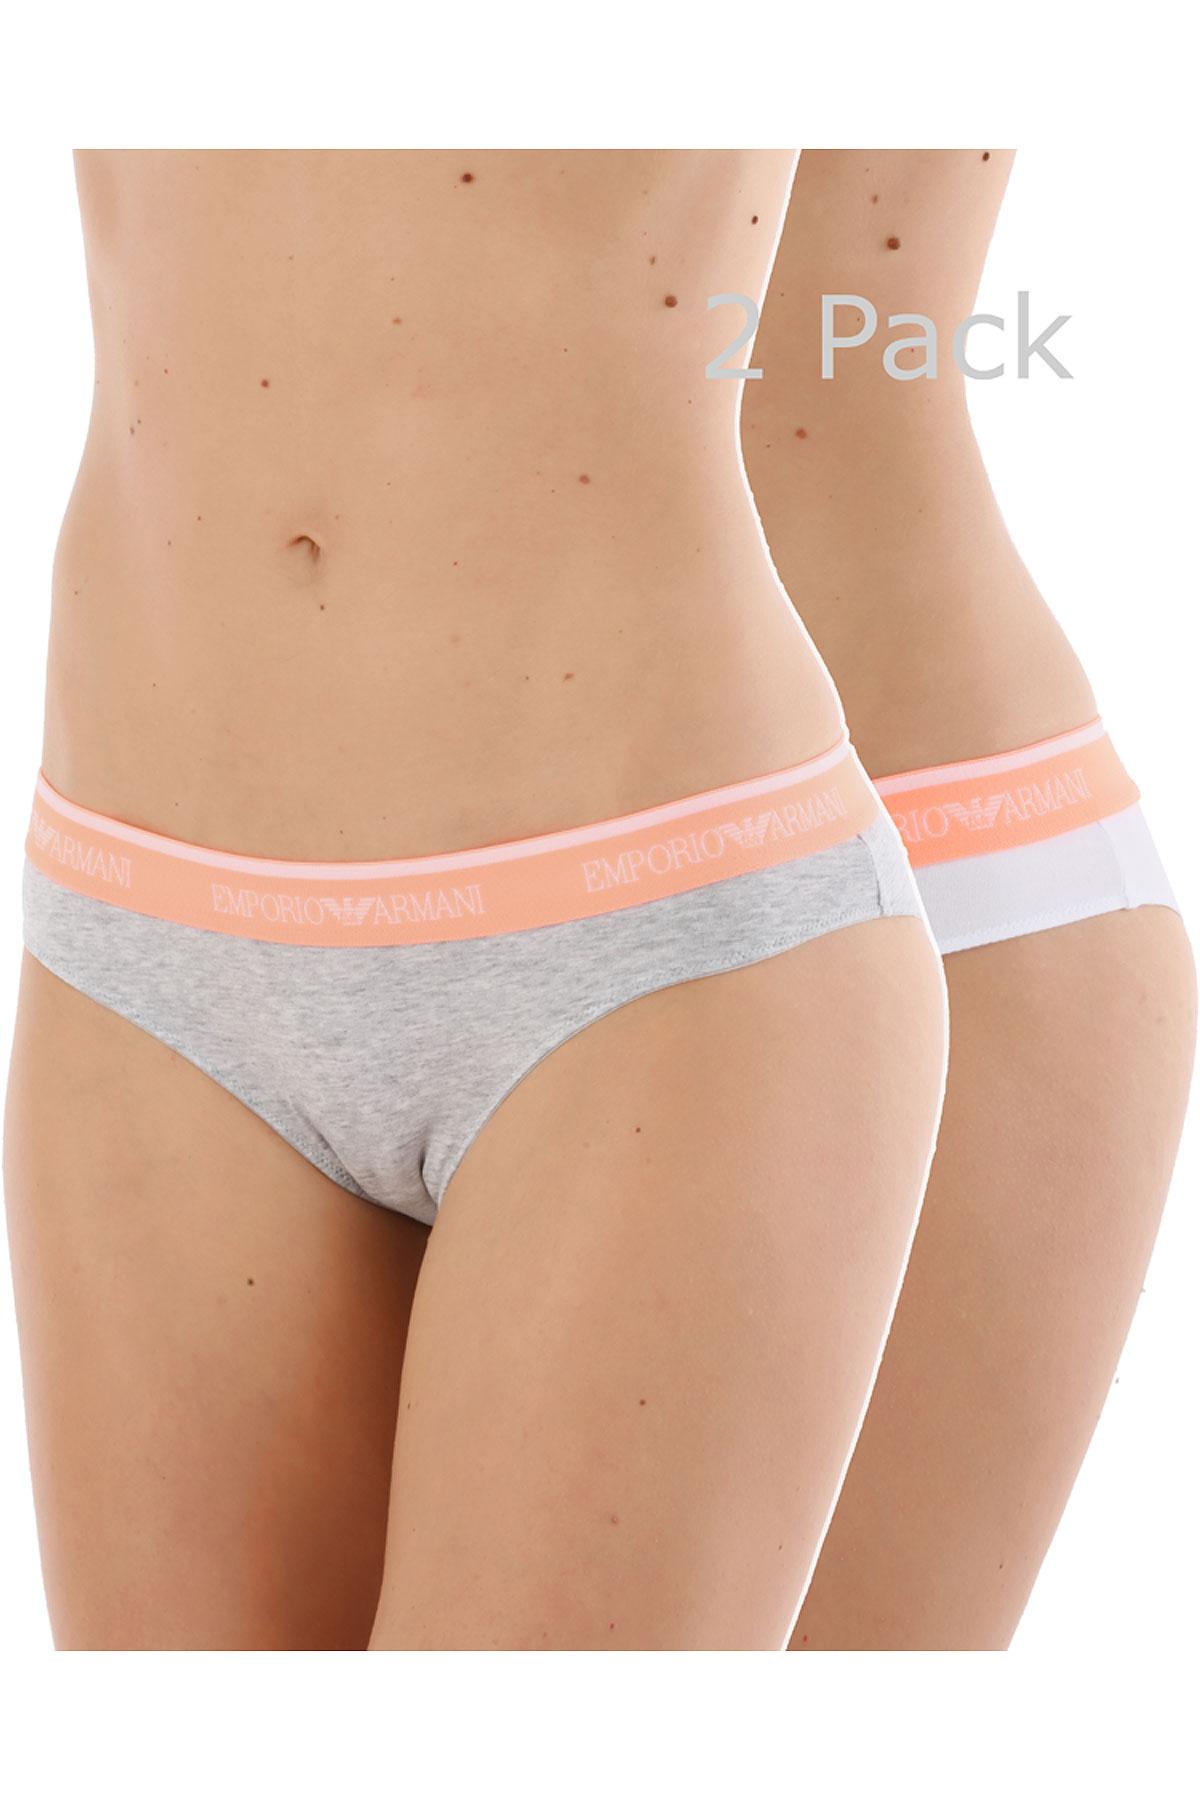 Image of Emporio Armani Womens Underwear On Sale, Bipack, Grey Melange, Cotton, 2017, XS M L